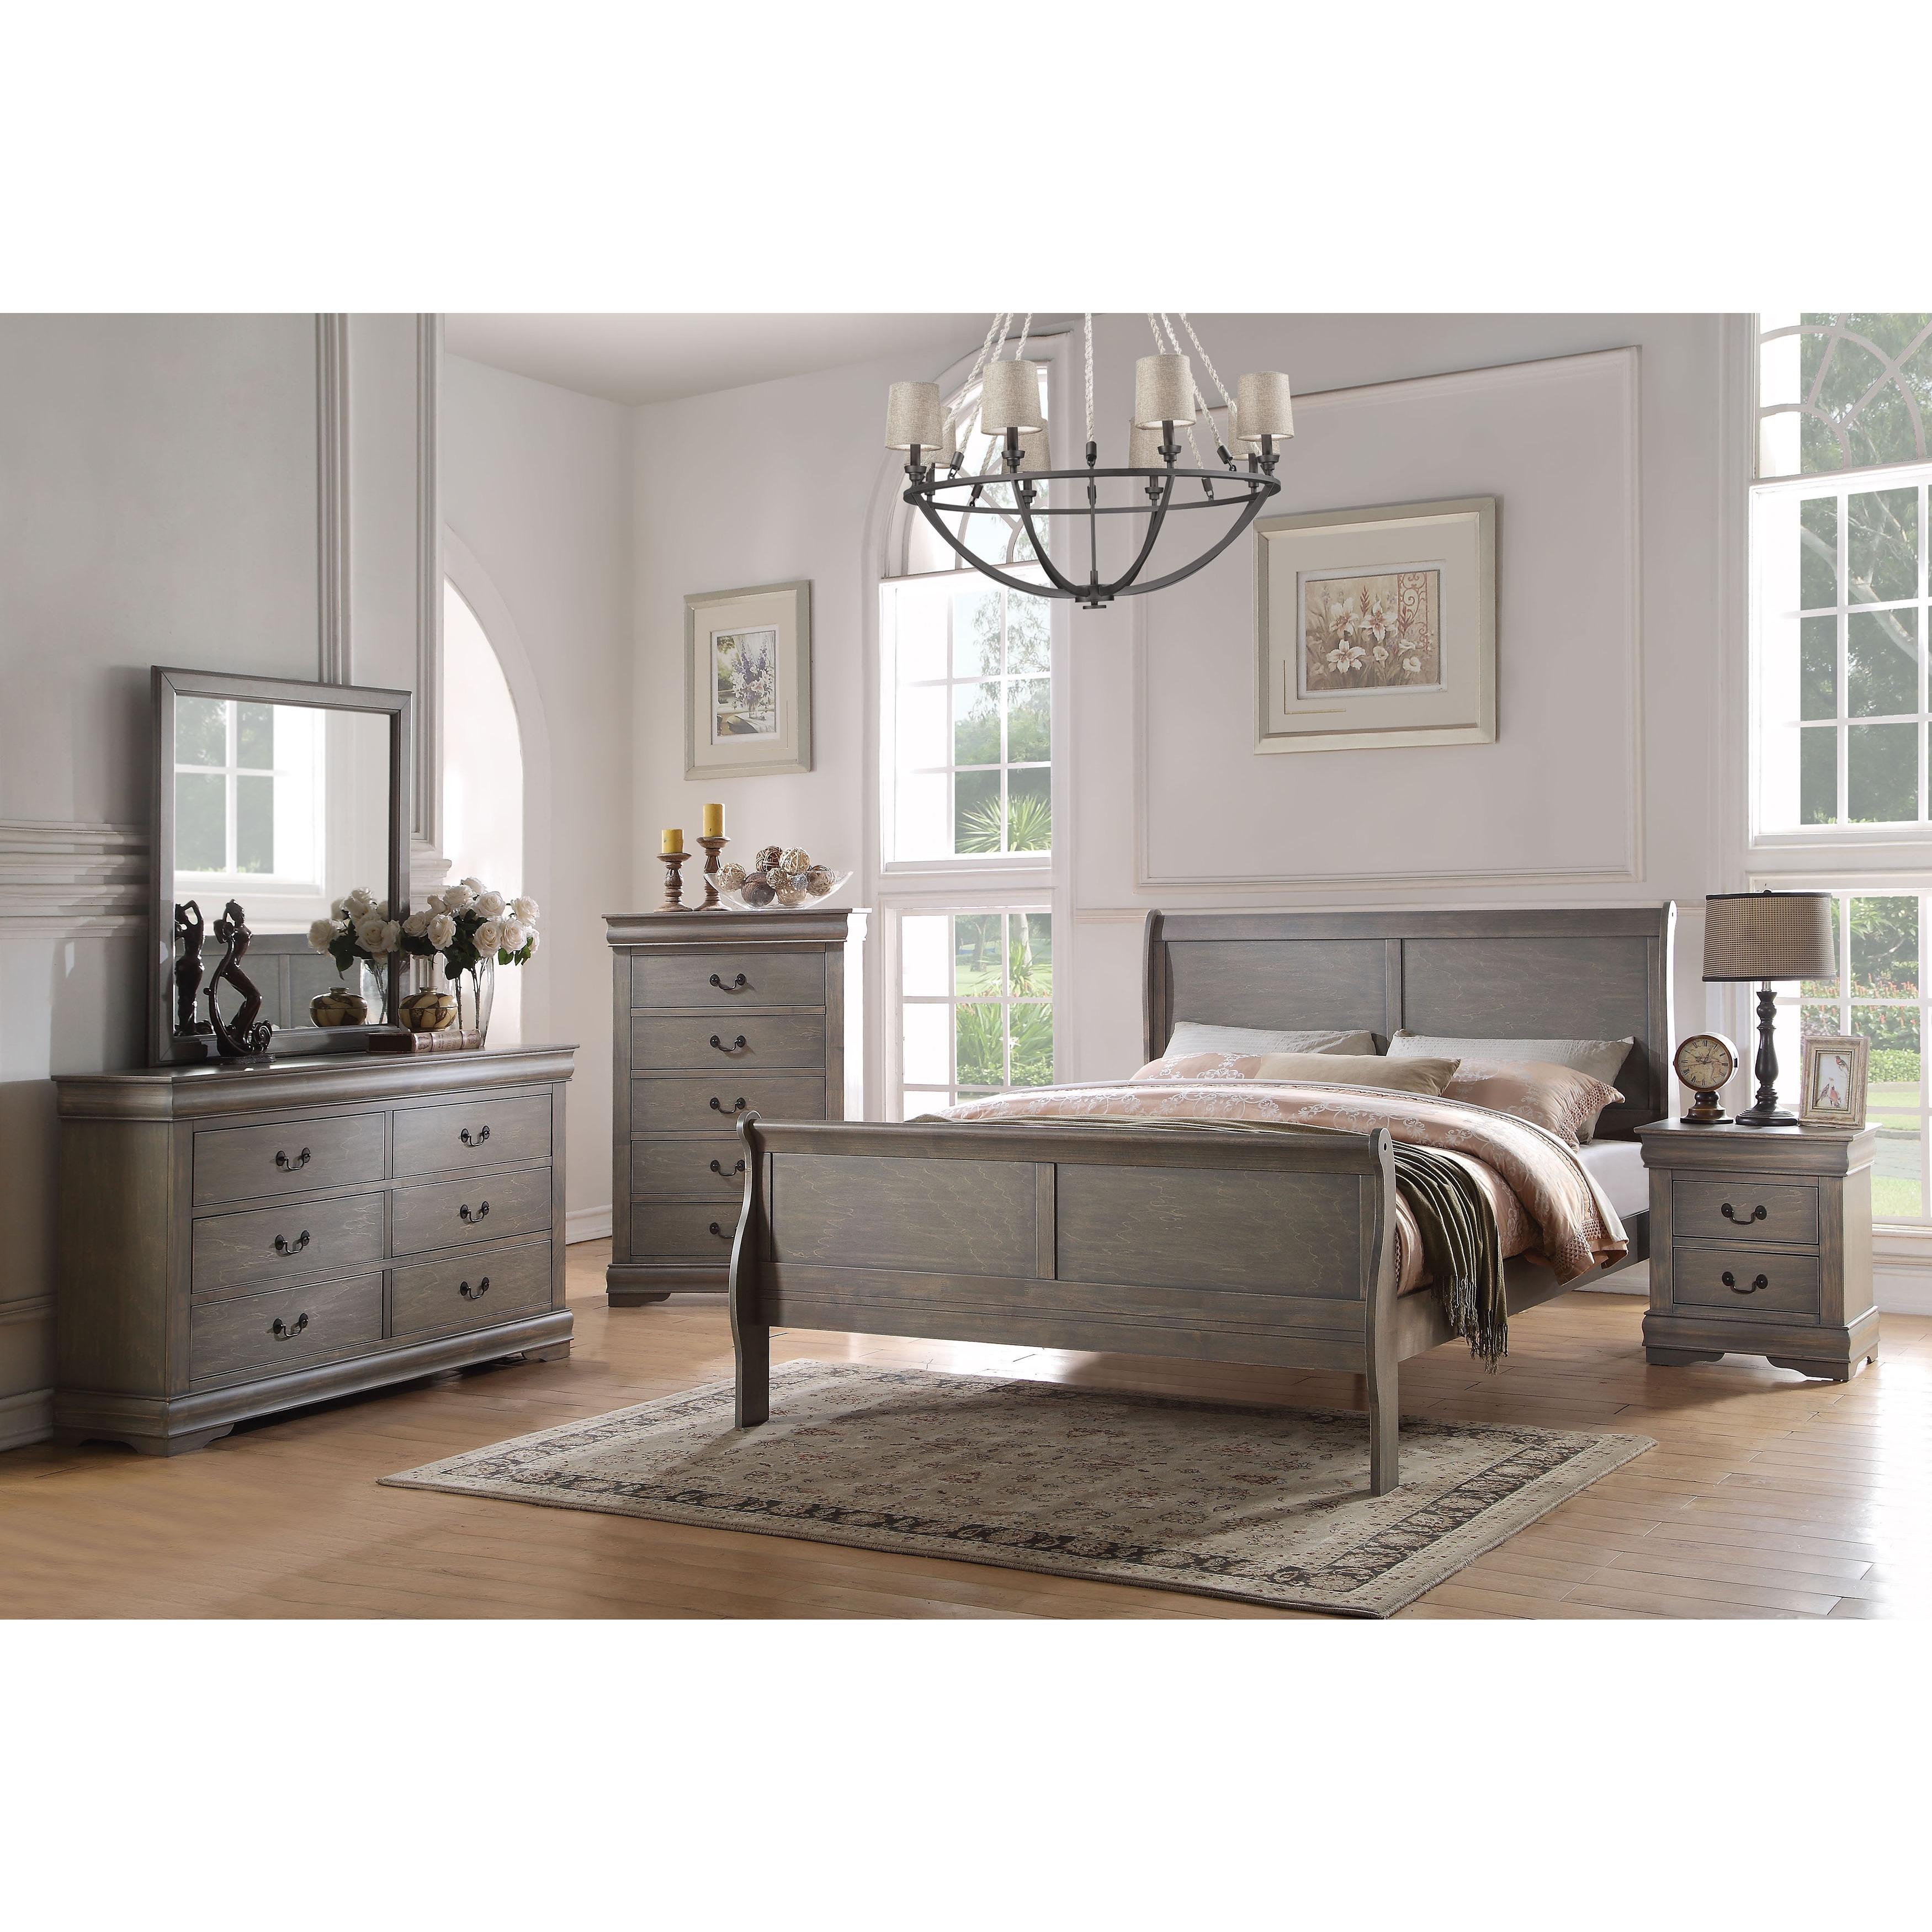 Acme Furniture Louis Philippe 4-Piece Bedroom Set, Antique Gray